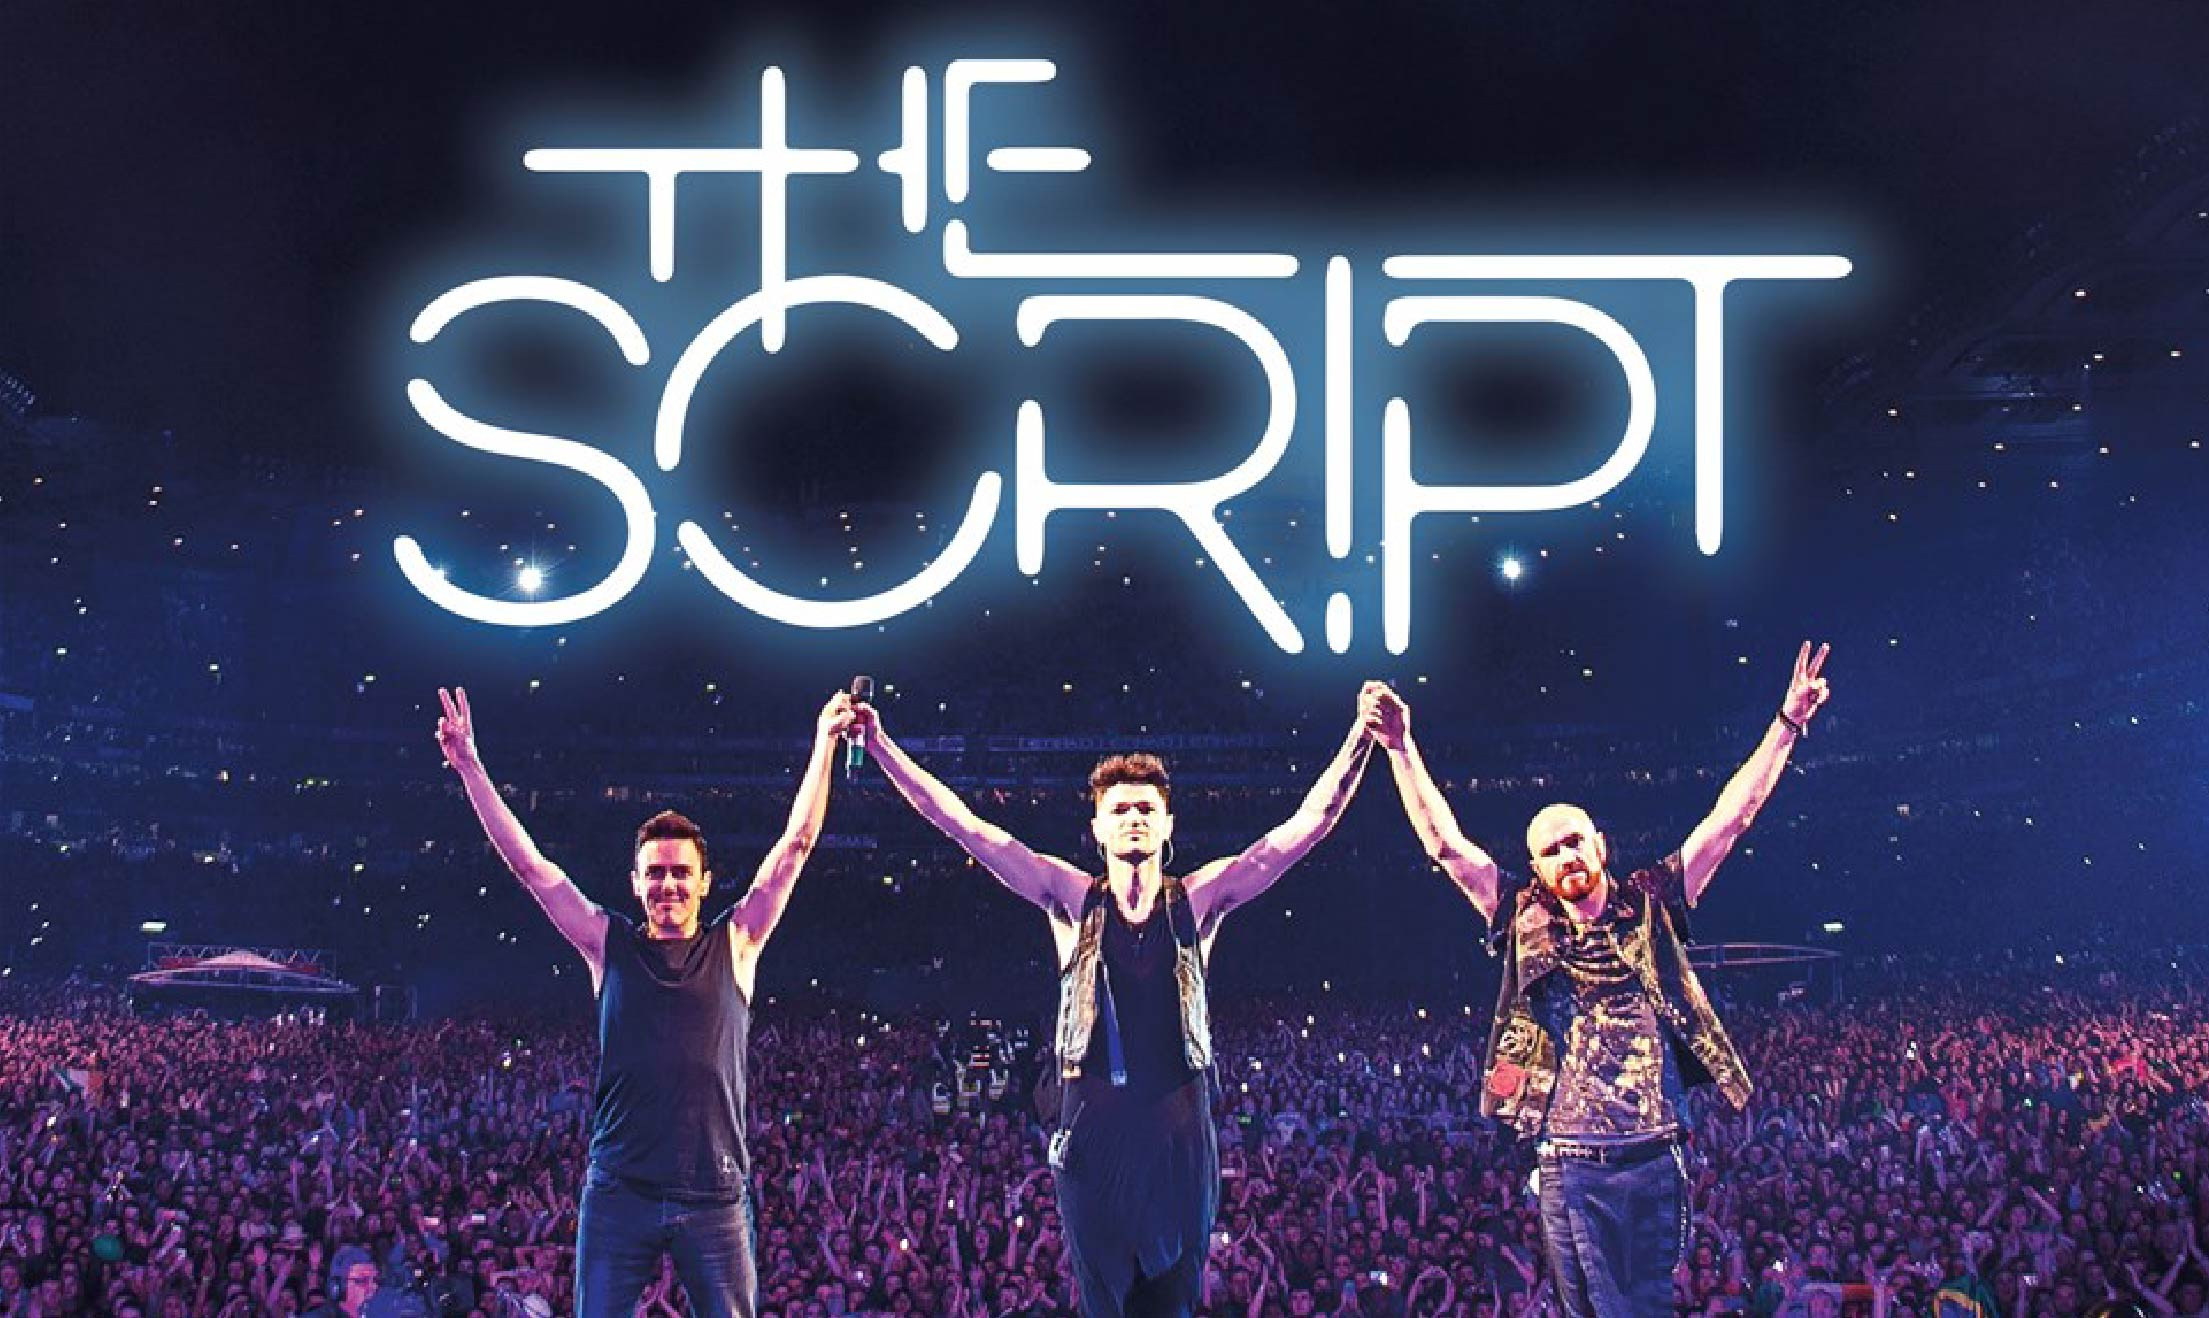 The Script live in Bangkok ประกาศคอนเสิร์ตในกรุงเทพฯ